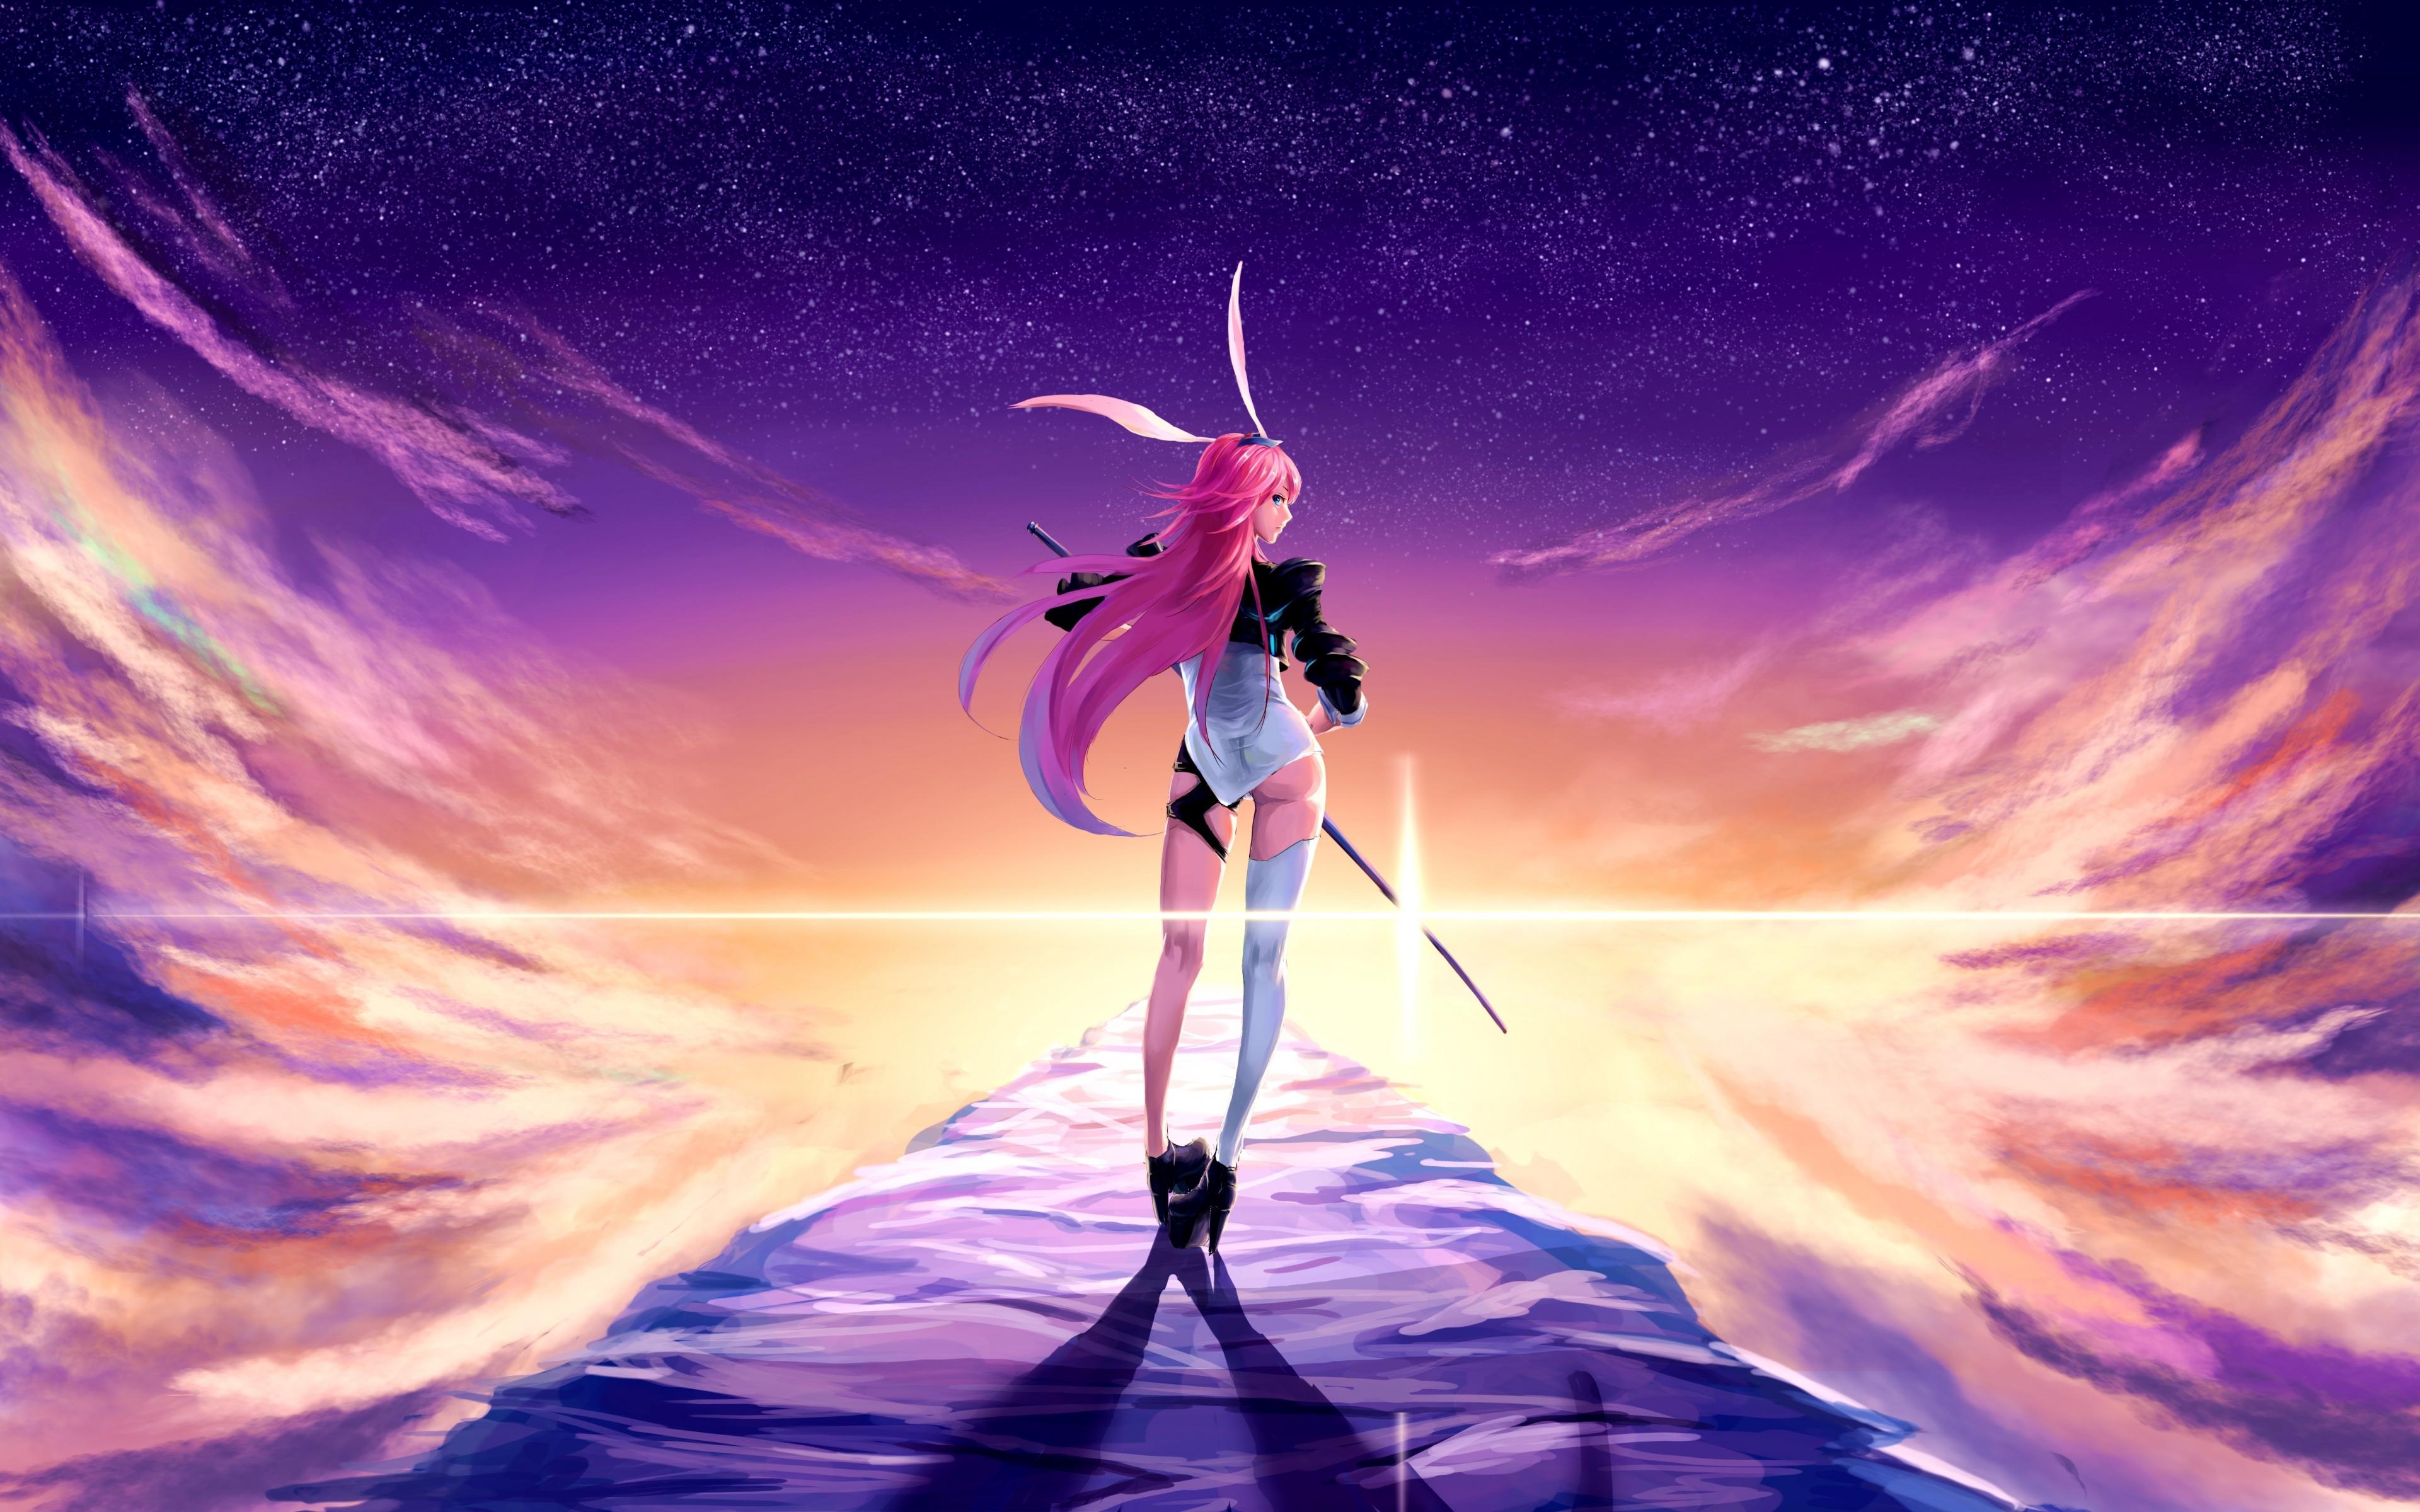 Download 3840x2400 Wallpaper Valkyrja Anime Girl Warrior